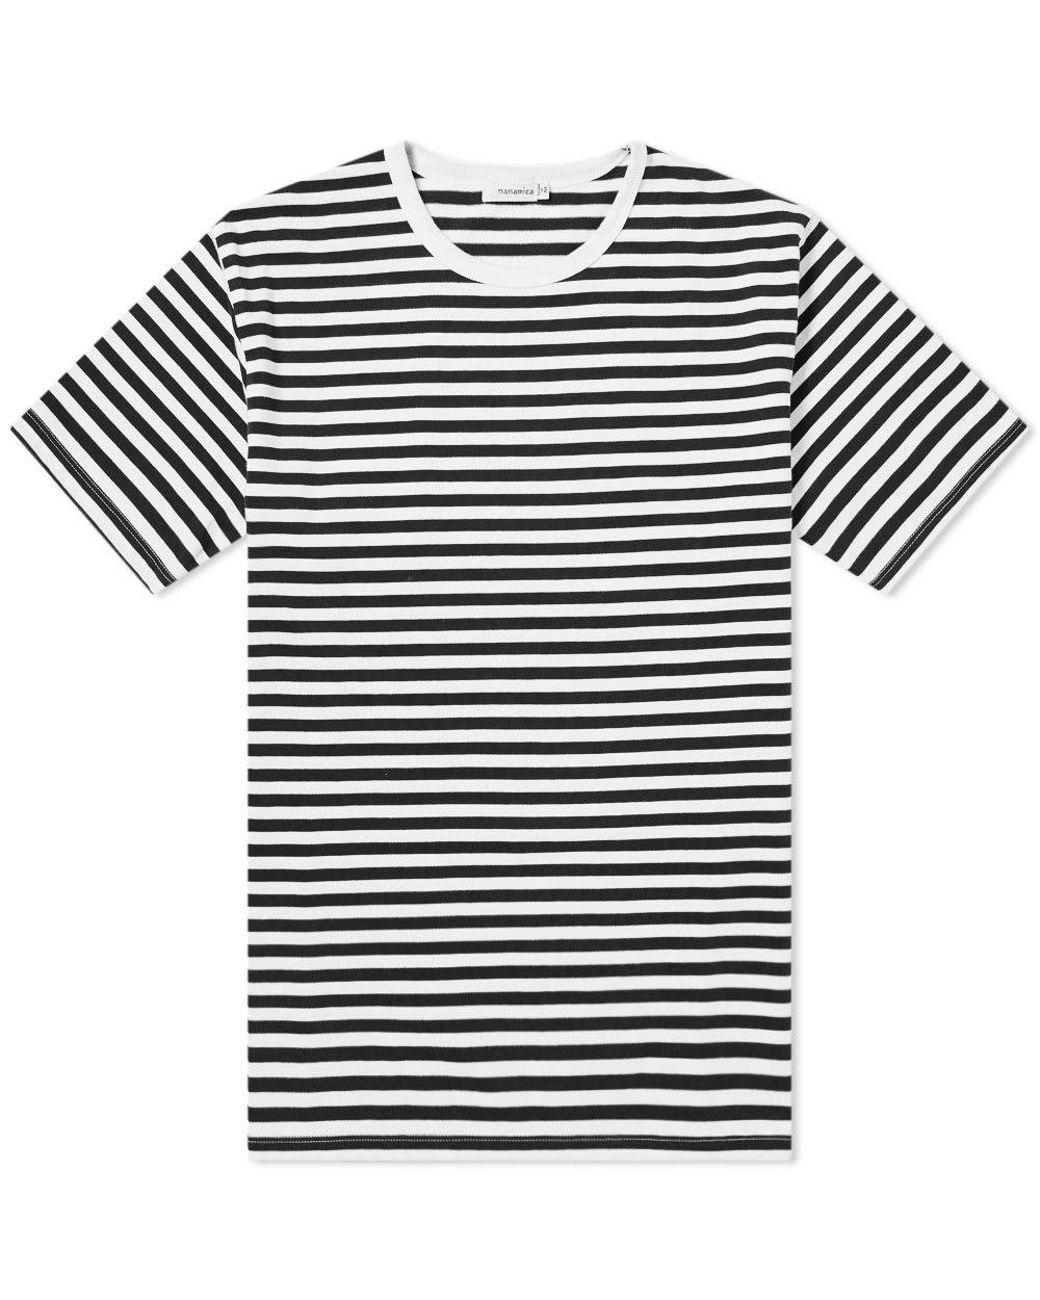 072ce28fe733 Nanamica Coolmax Stripe Jersey Tee in Black for Men - Save 35% - Lyst